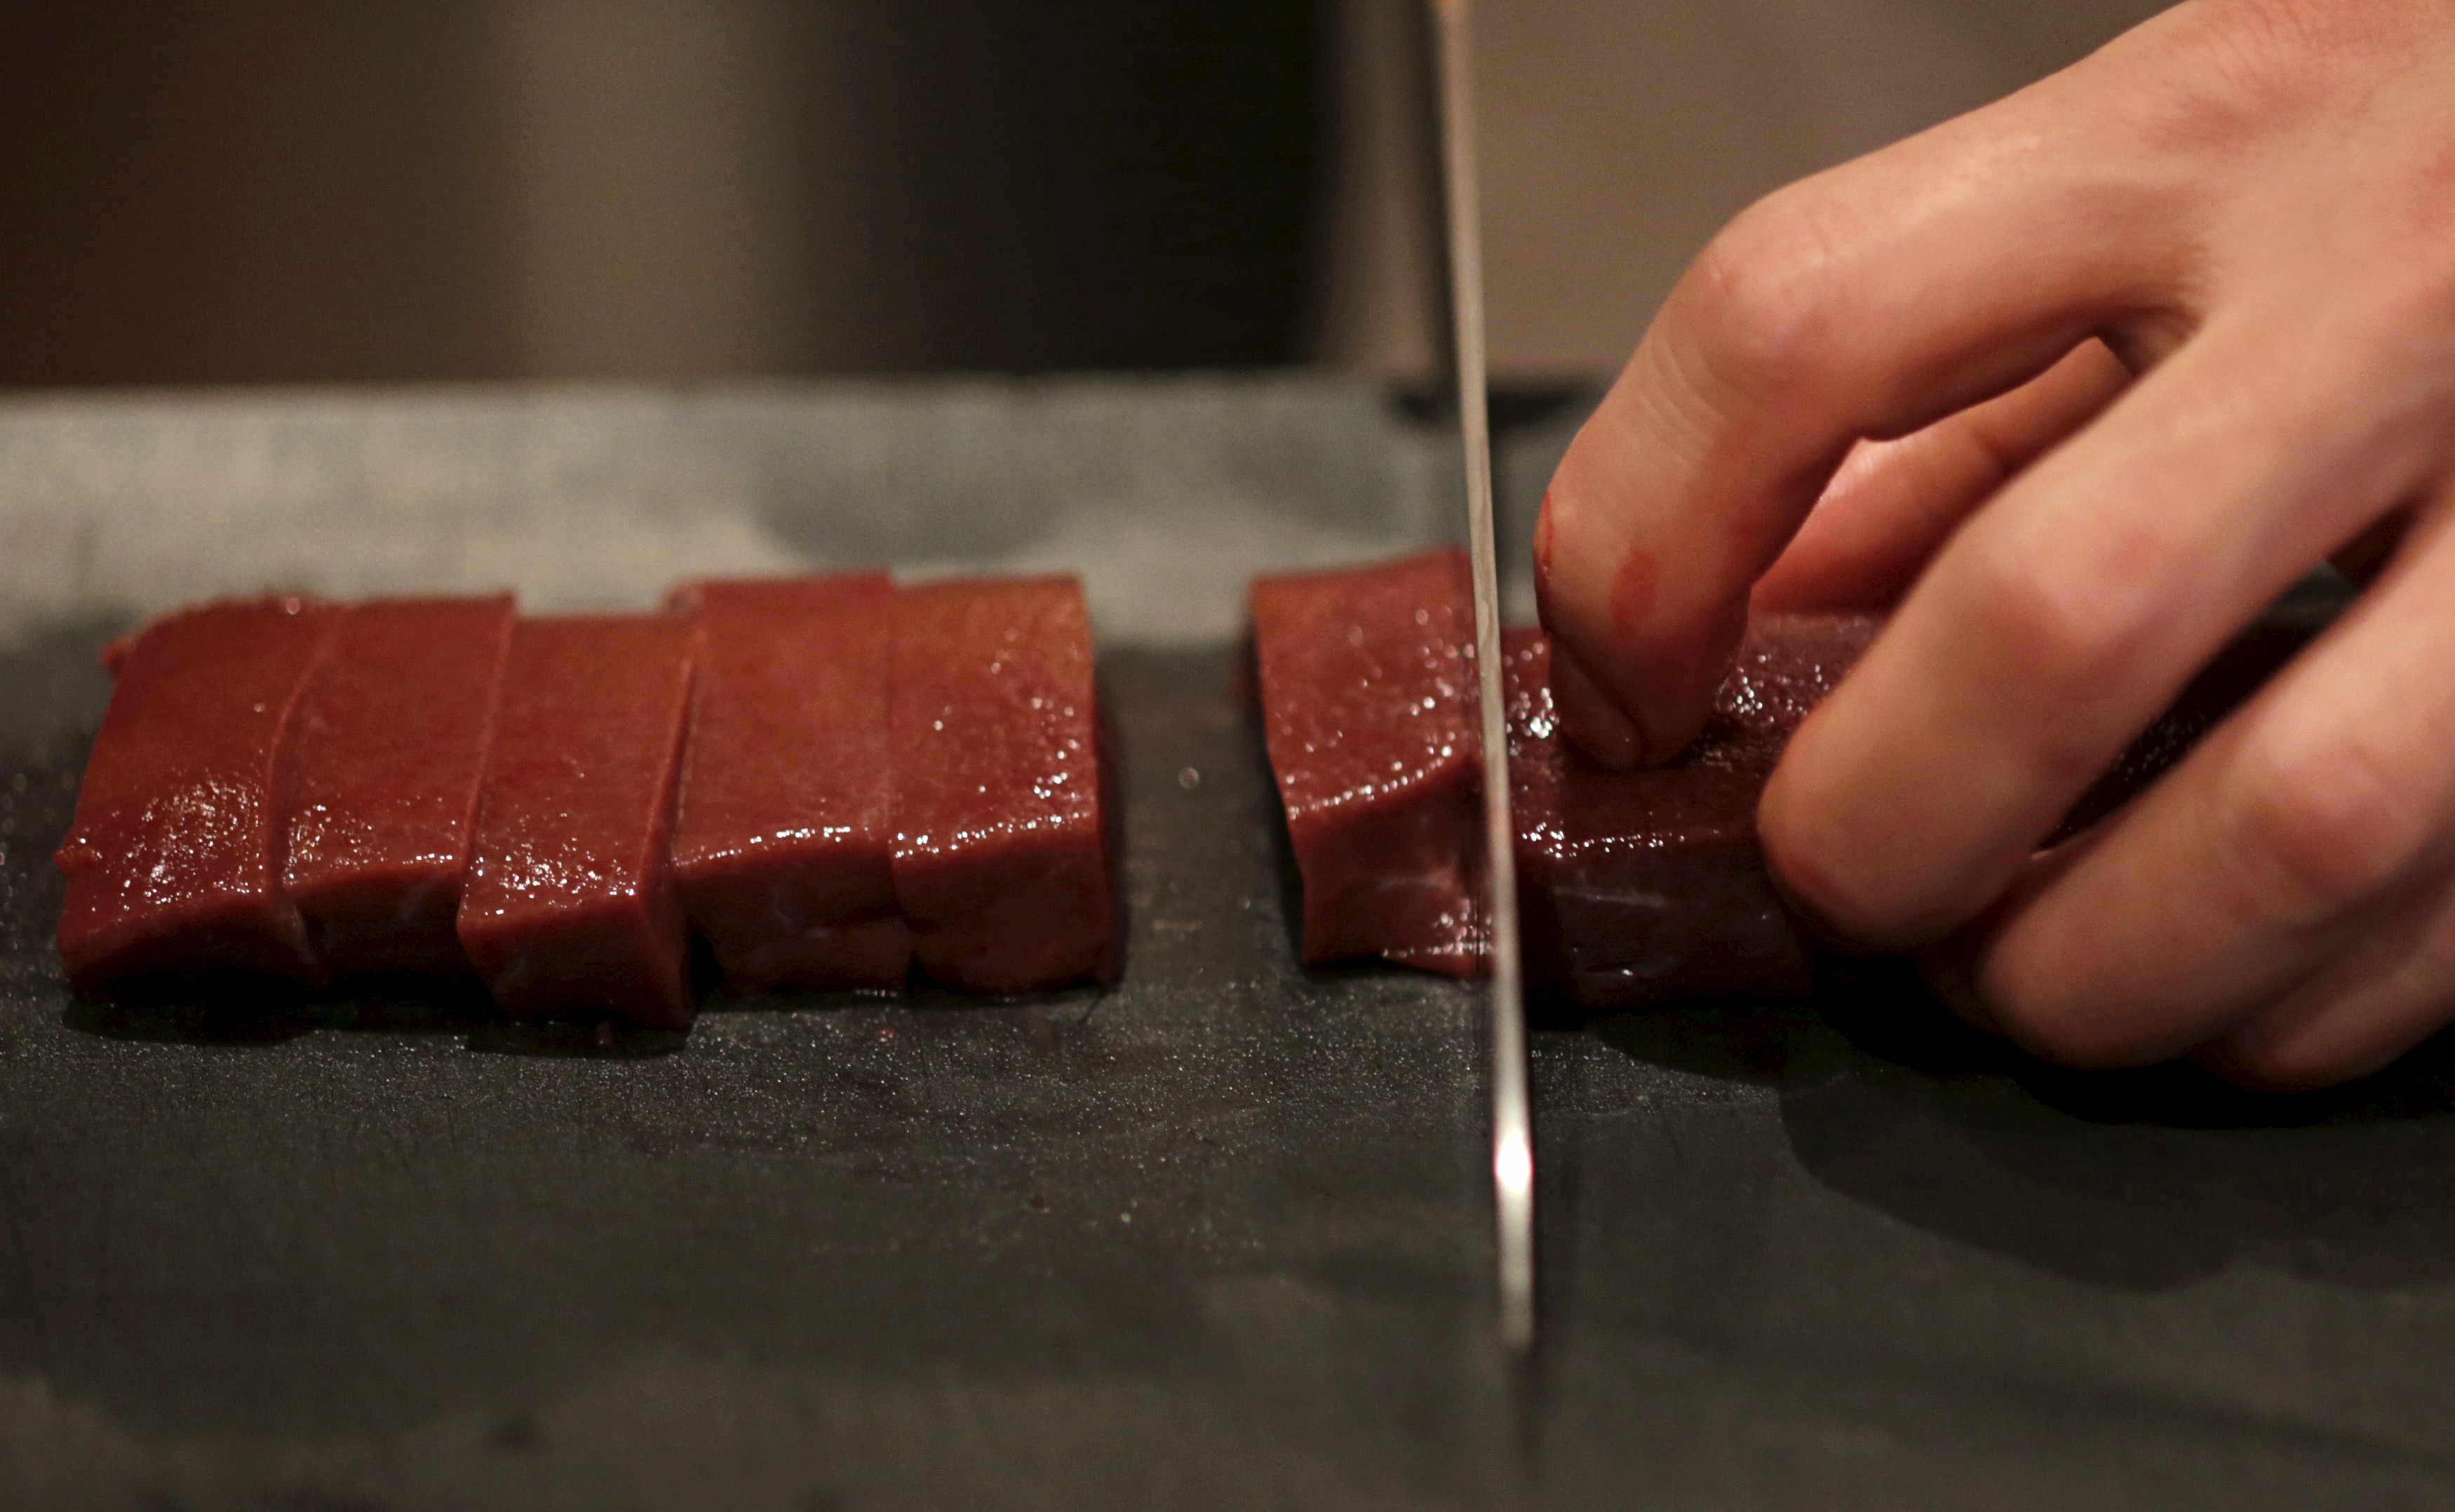 The Jordan Peterson Meat-Only Diet - The Atlantic